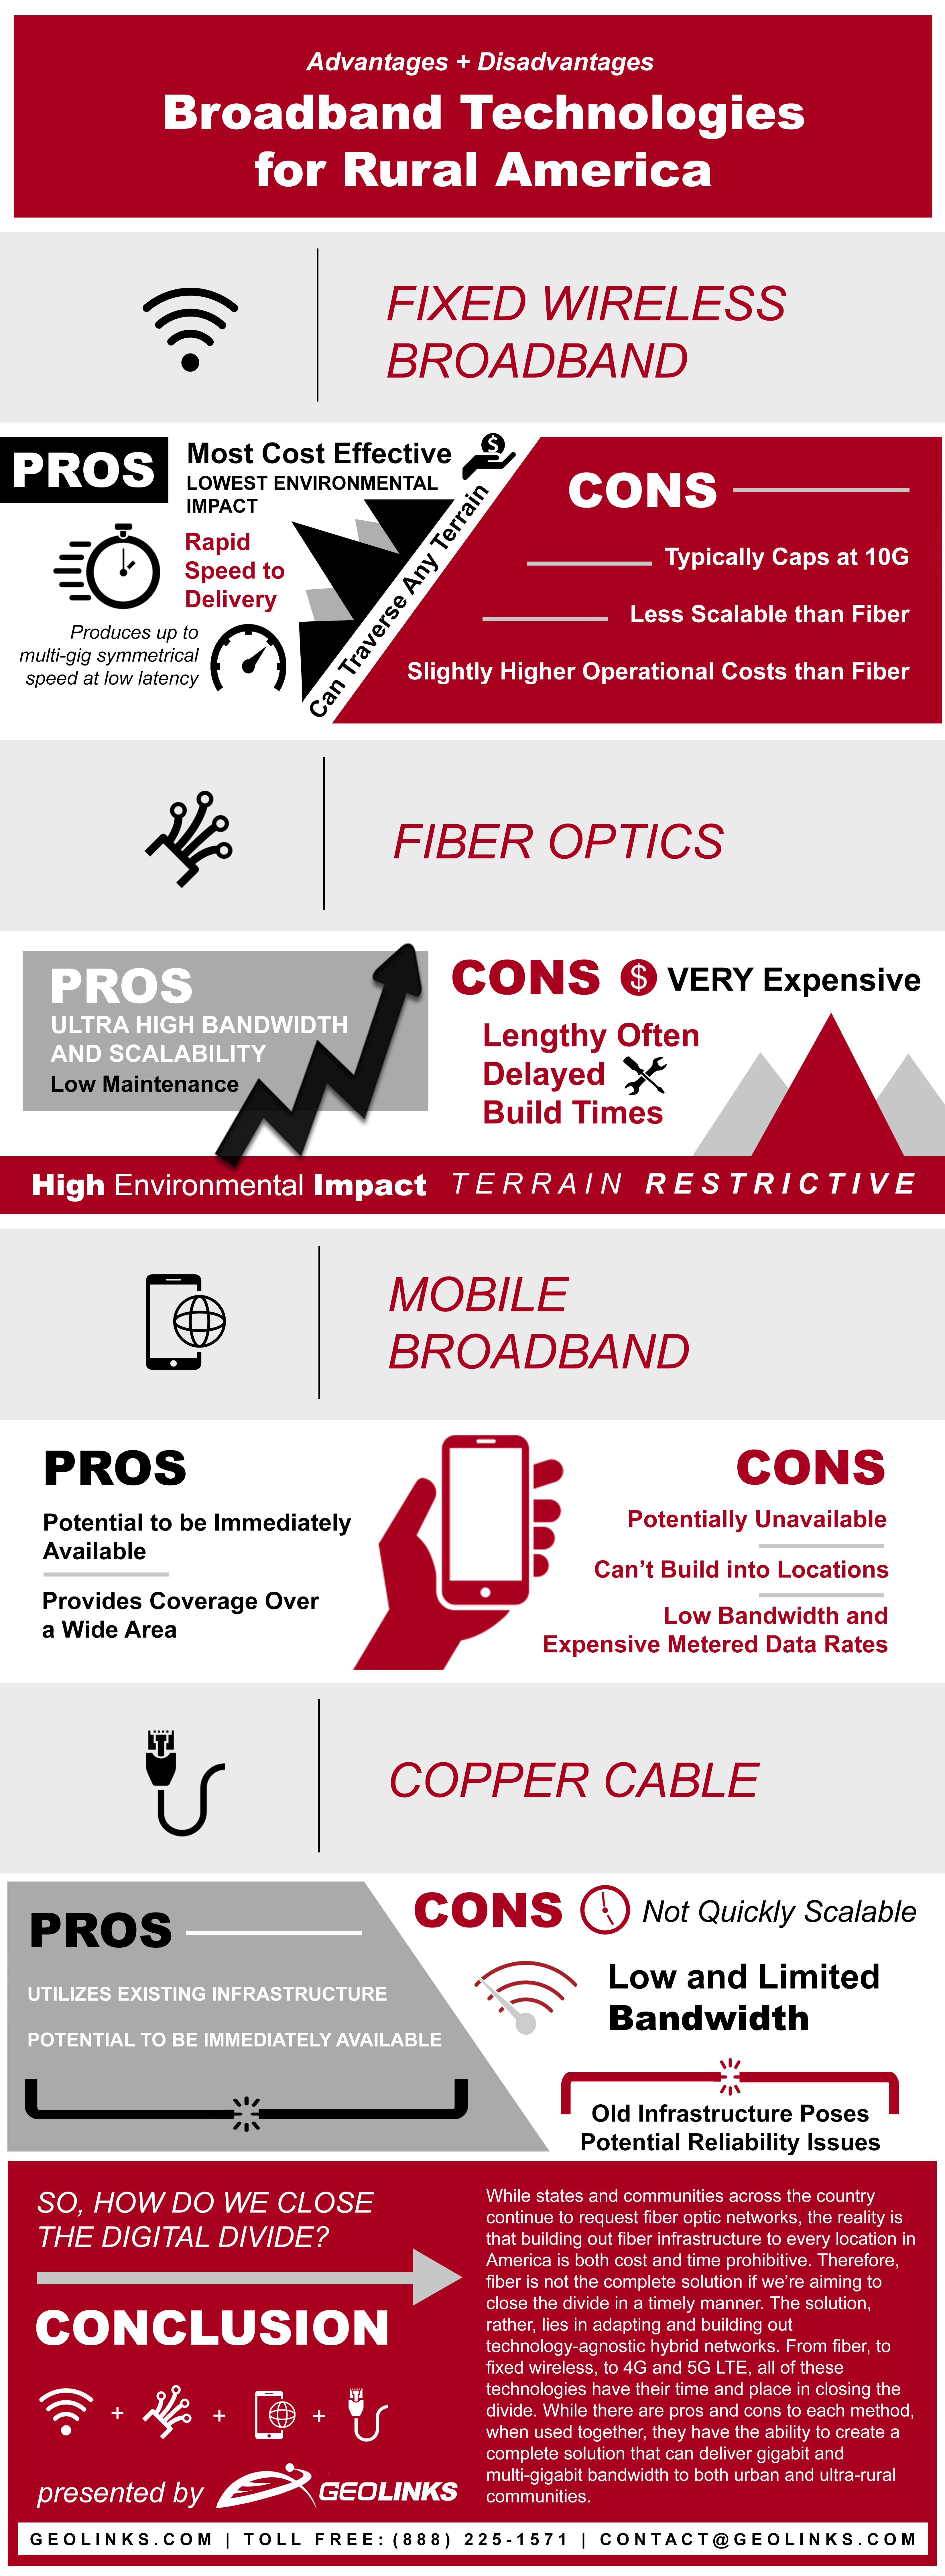 BroadbandTechnologiesforRuralAmerica_GeoLinks